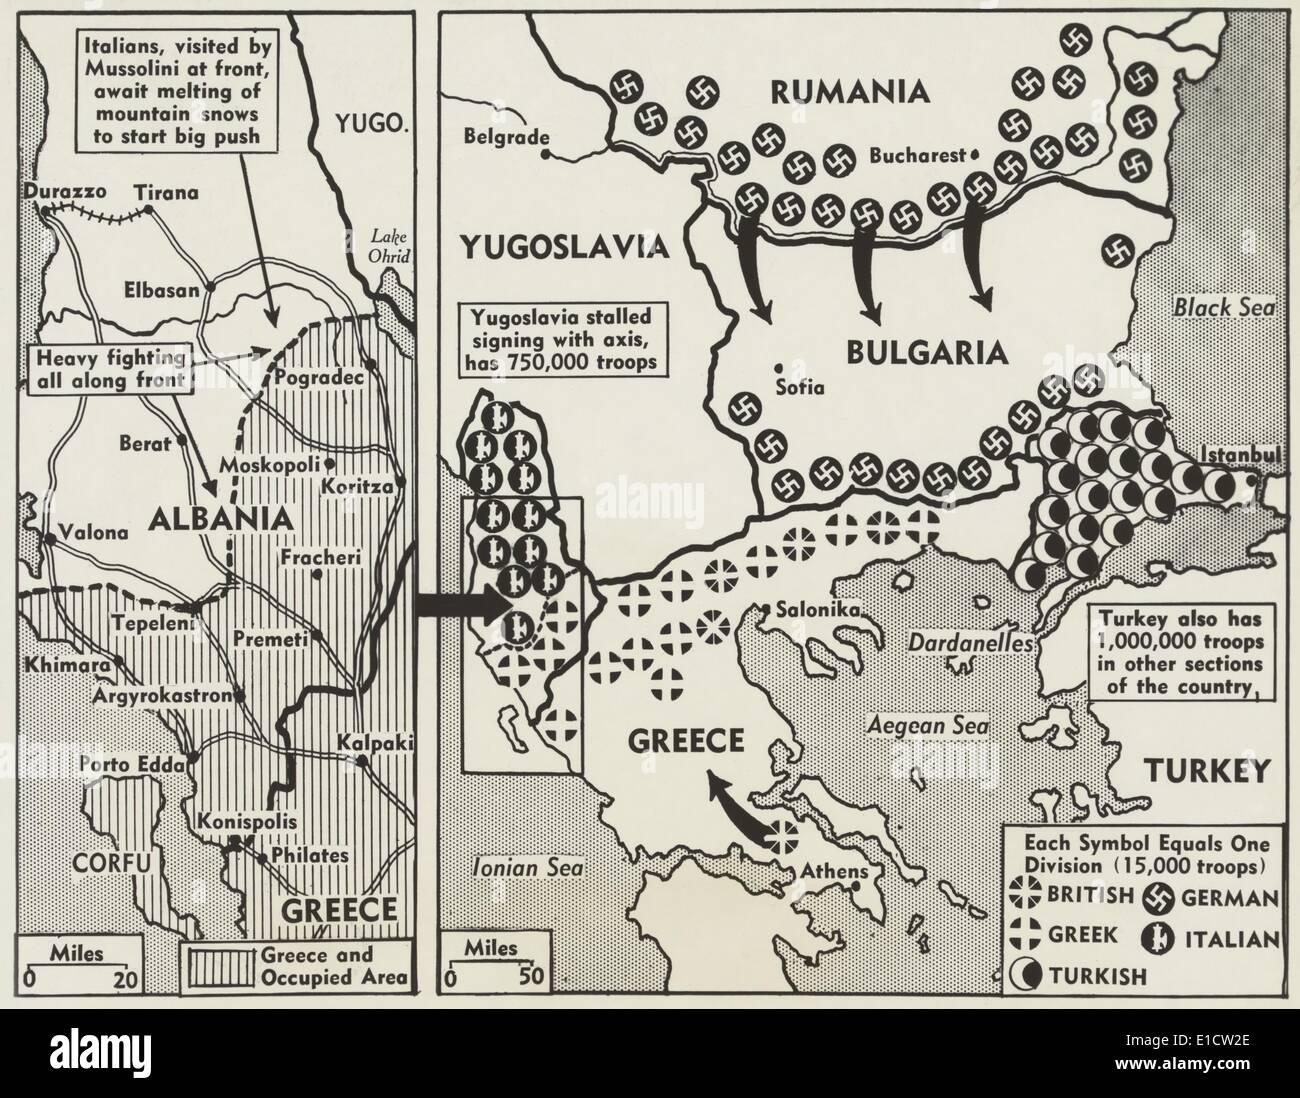 World war 2 map of greece and the balkans in 1941 symbols show world war 2 map of greece and the balkans in 1941 symbols show the positions of british german greek italian and turkish buycottarizona Gallery